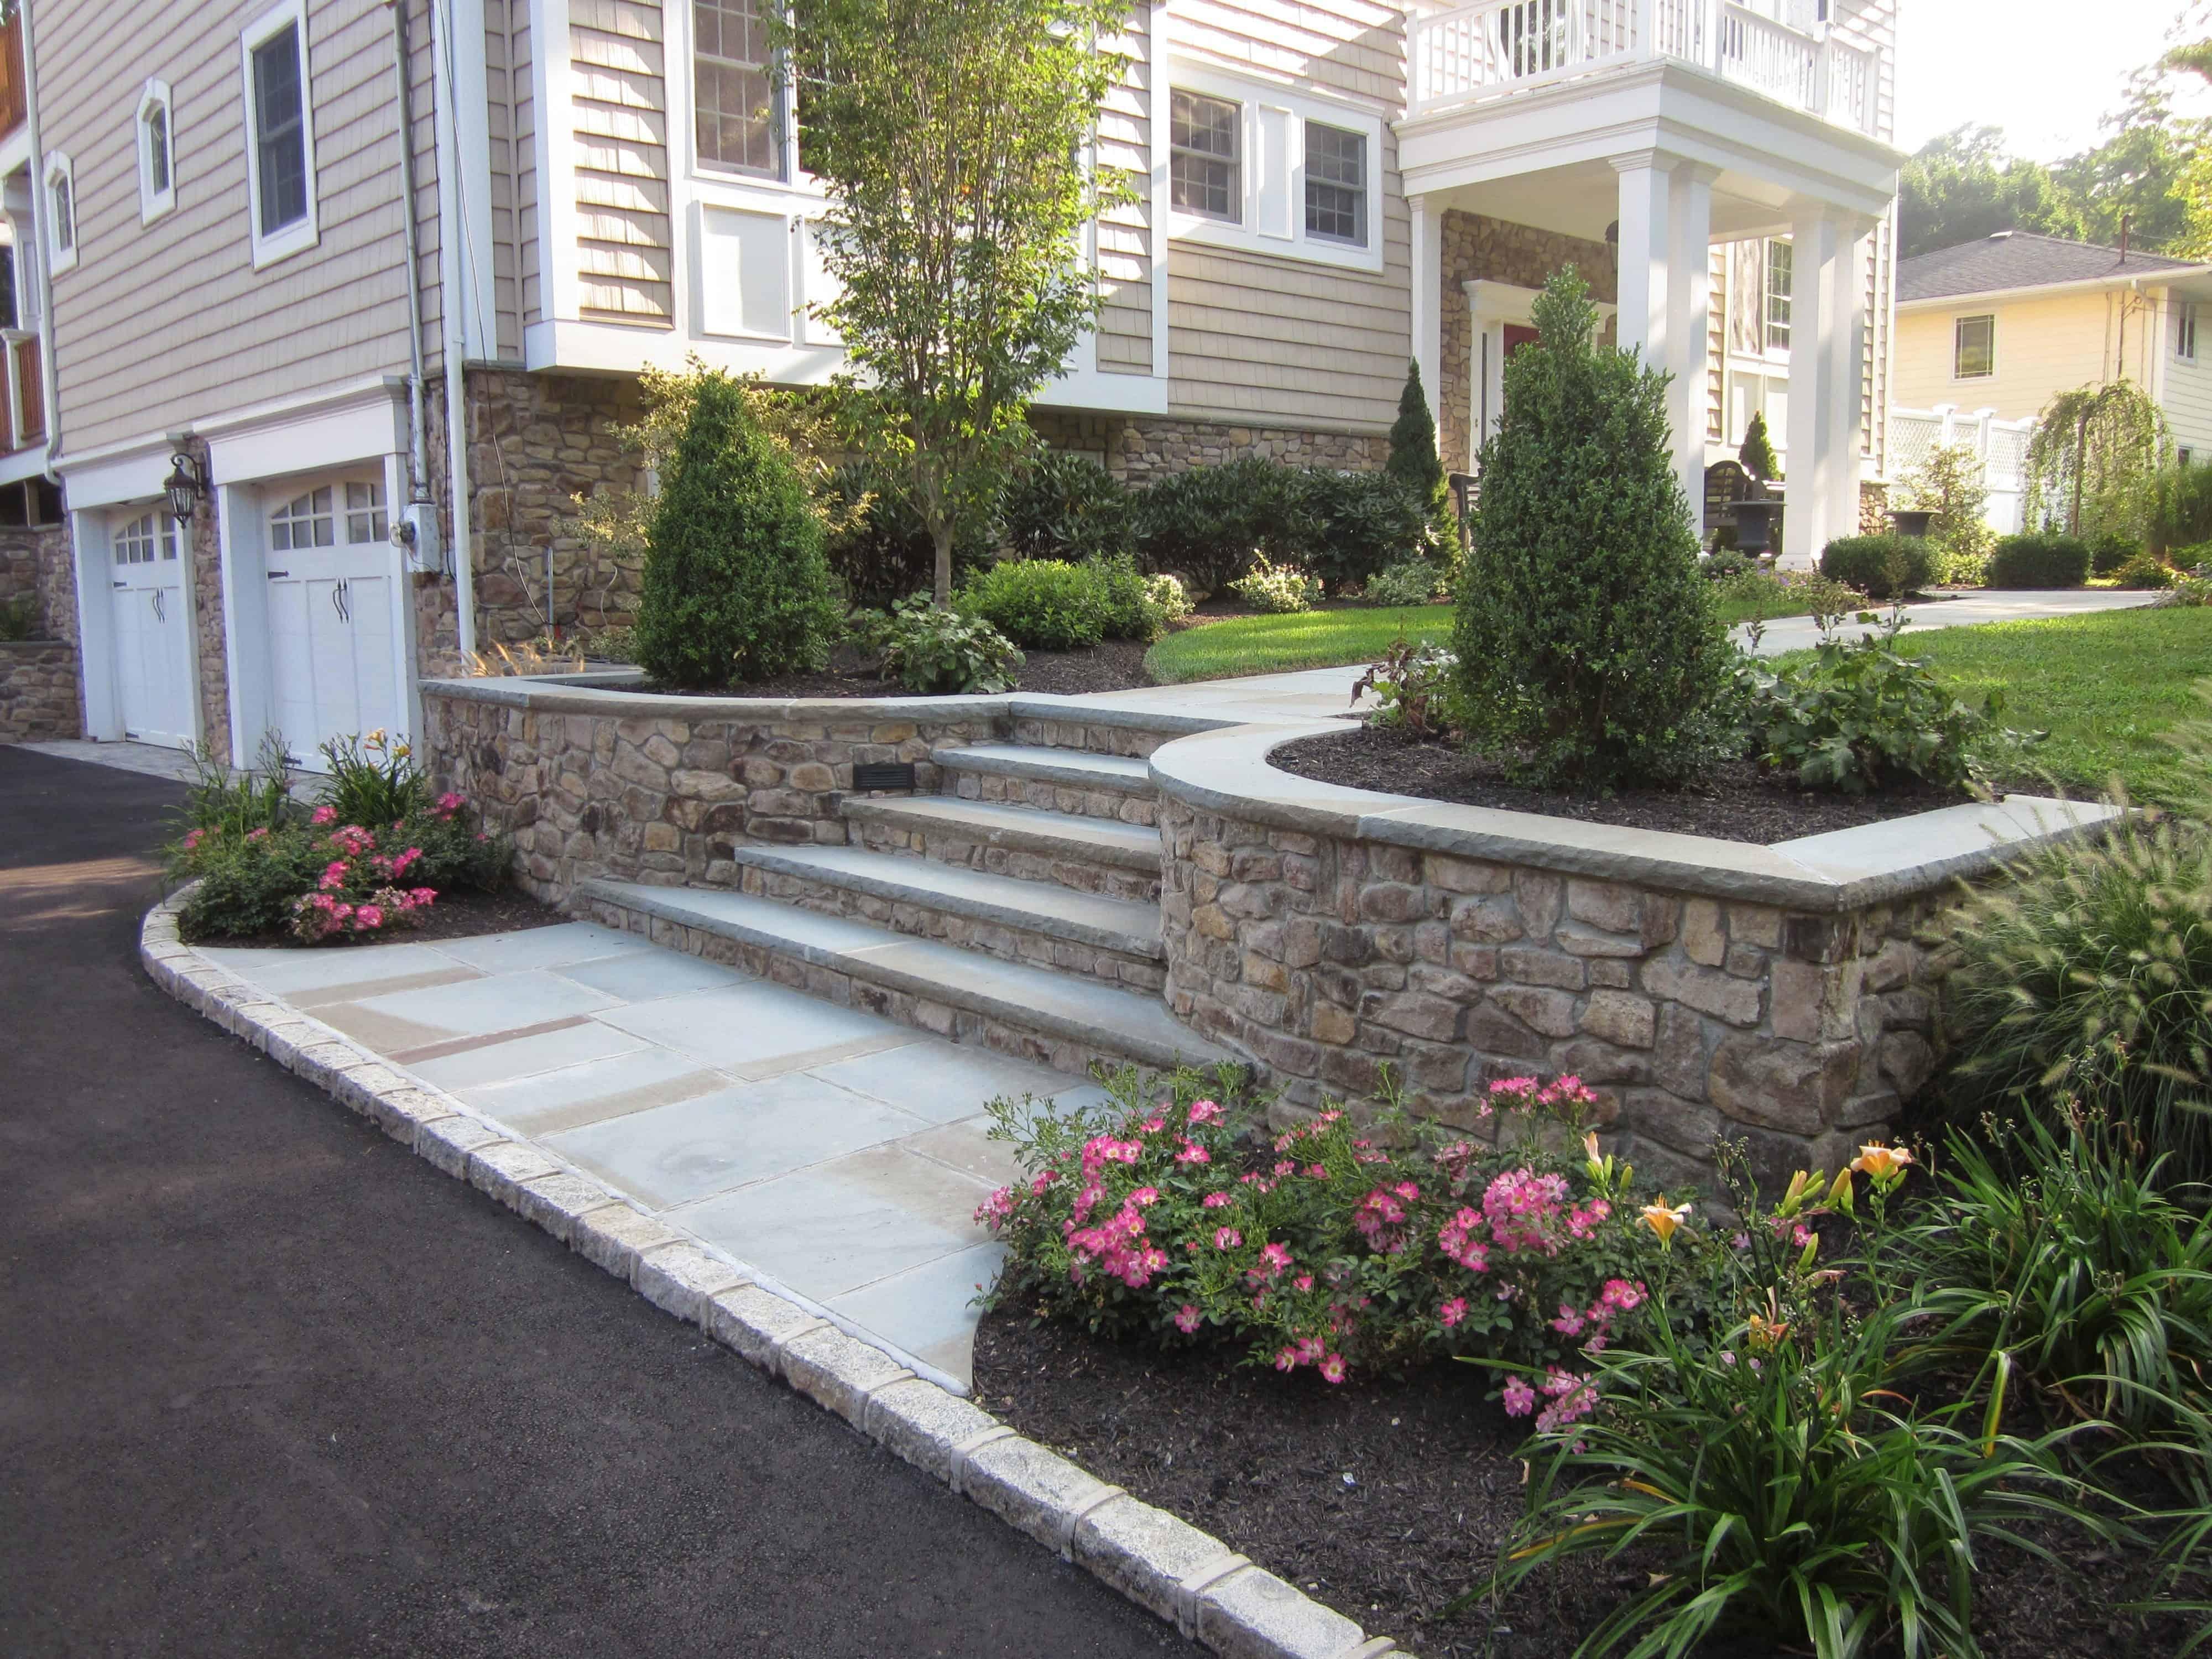 Belgium Block Driveway - Bluestone Entrance with Cultured Stone walls and Bluestone Treads - Glen Cove, Long Island NY